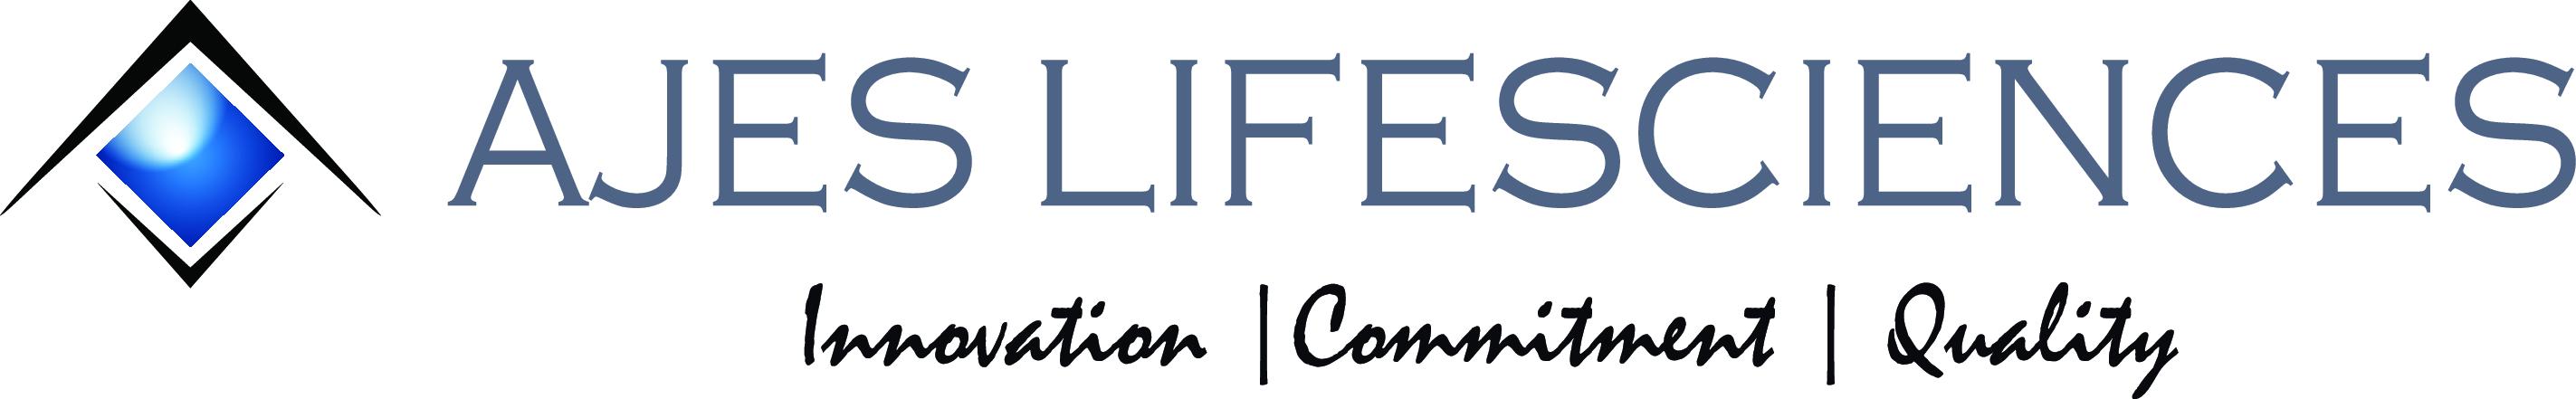 Ajes Lifesciences partner logo